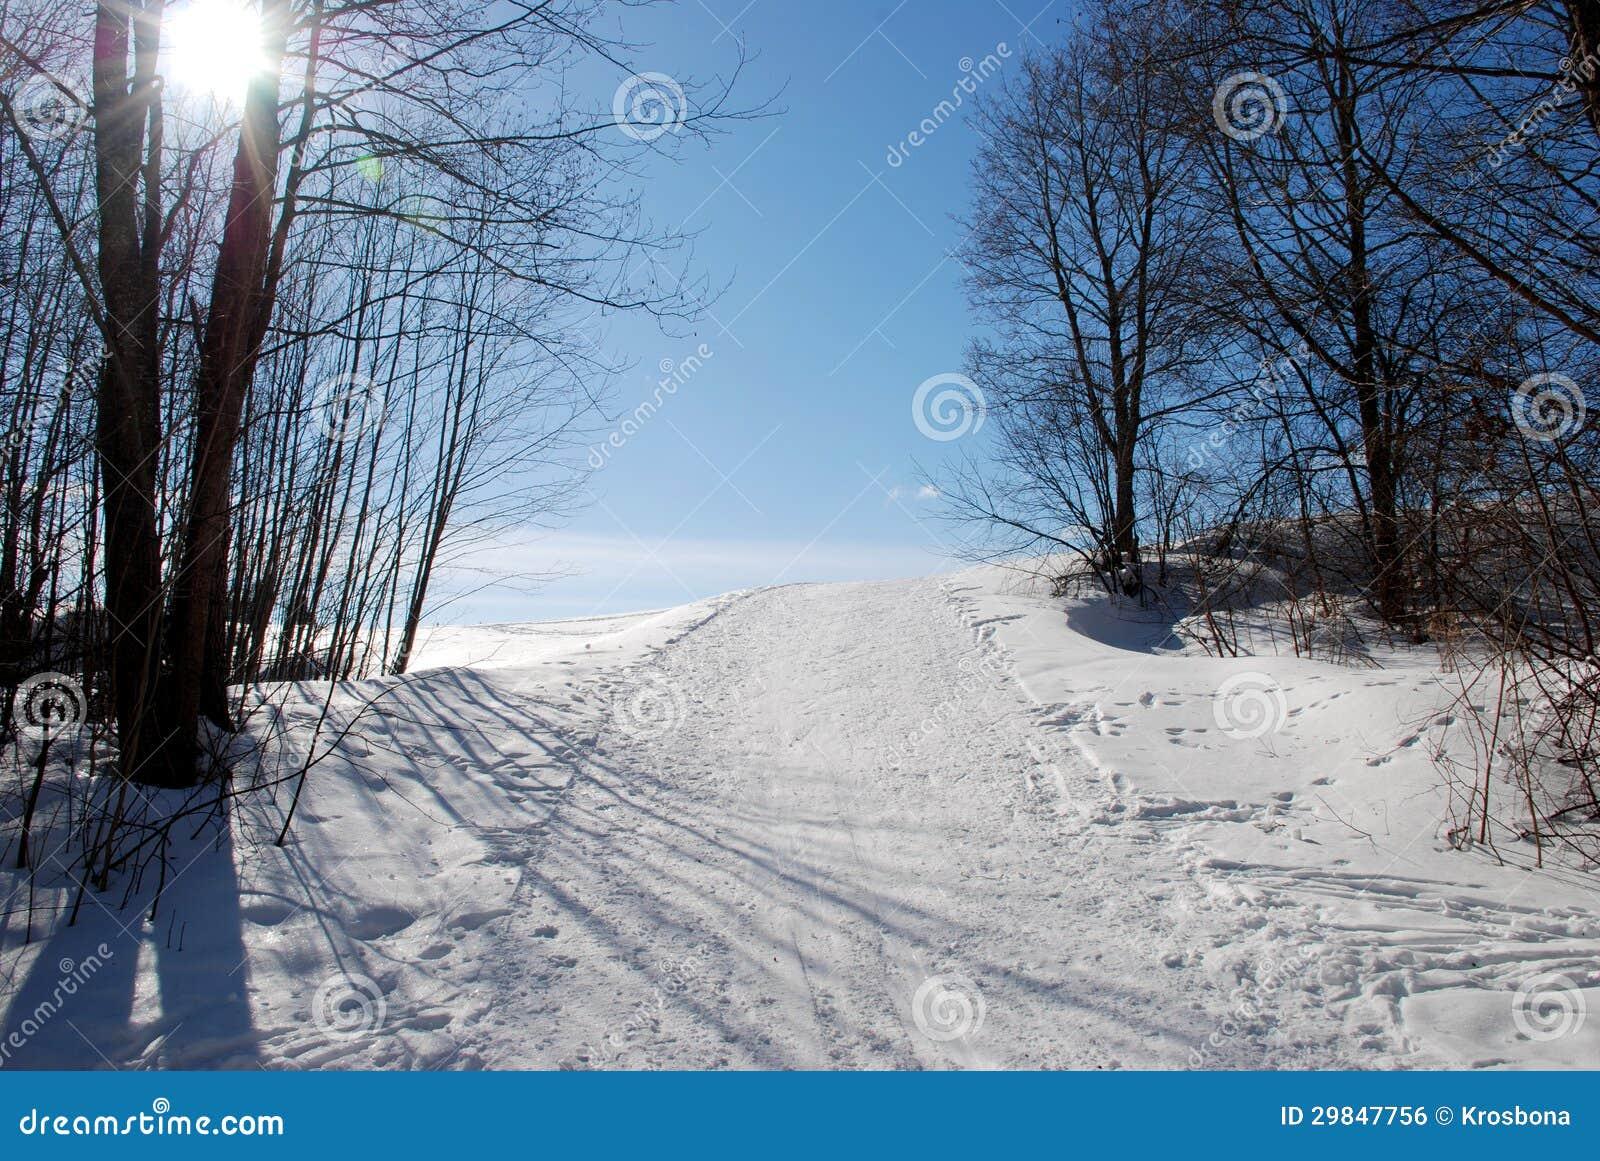 Ski touring track